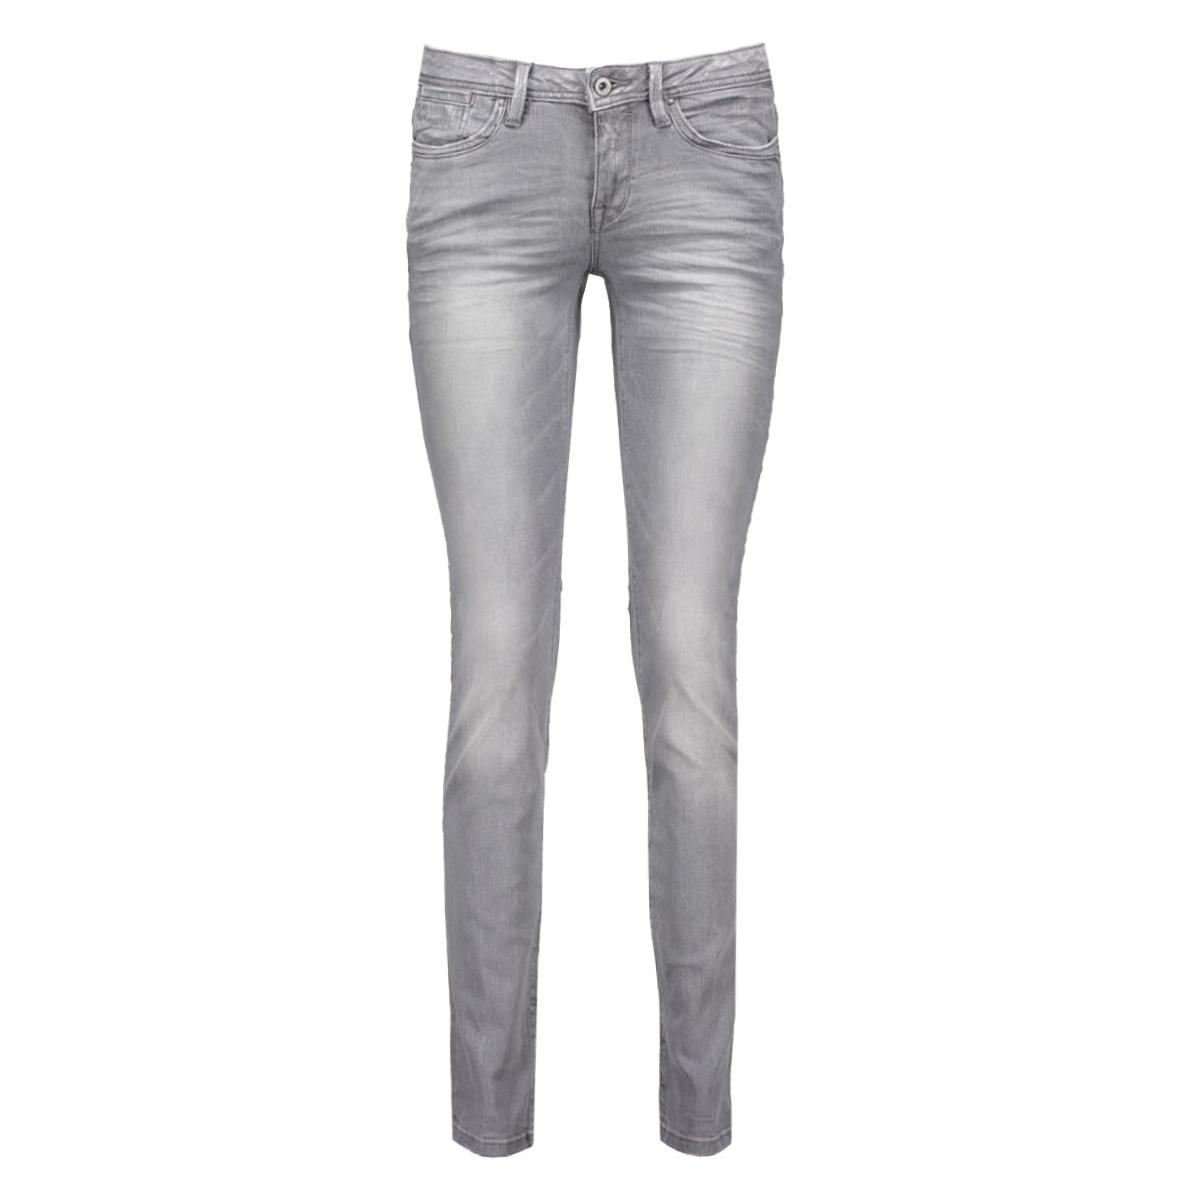 995cc1b926 edc jeans c942